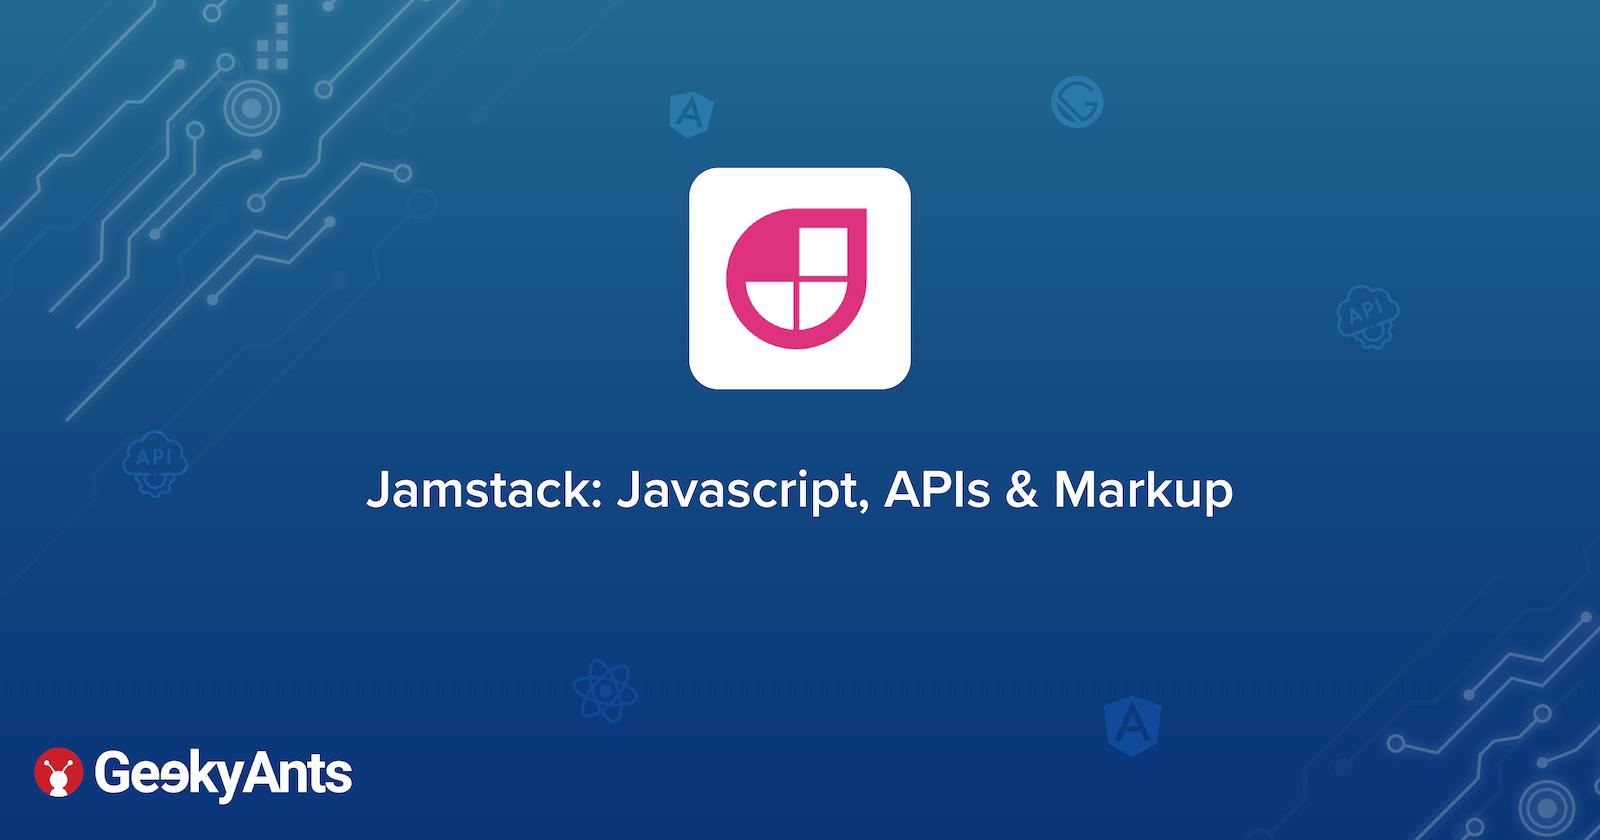 Jamstack: Javascript, APIs & Markup